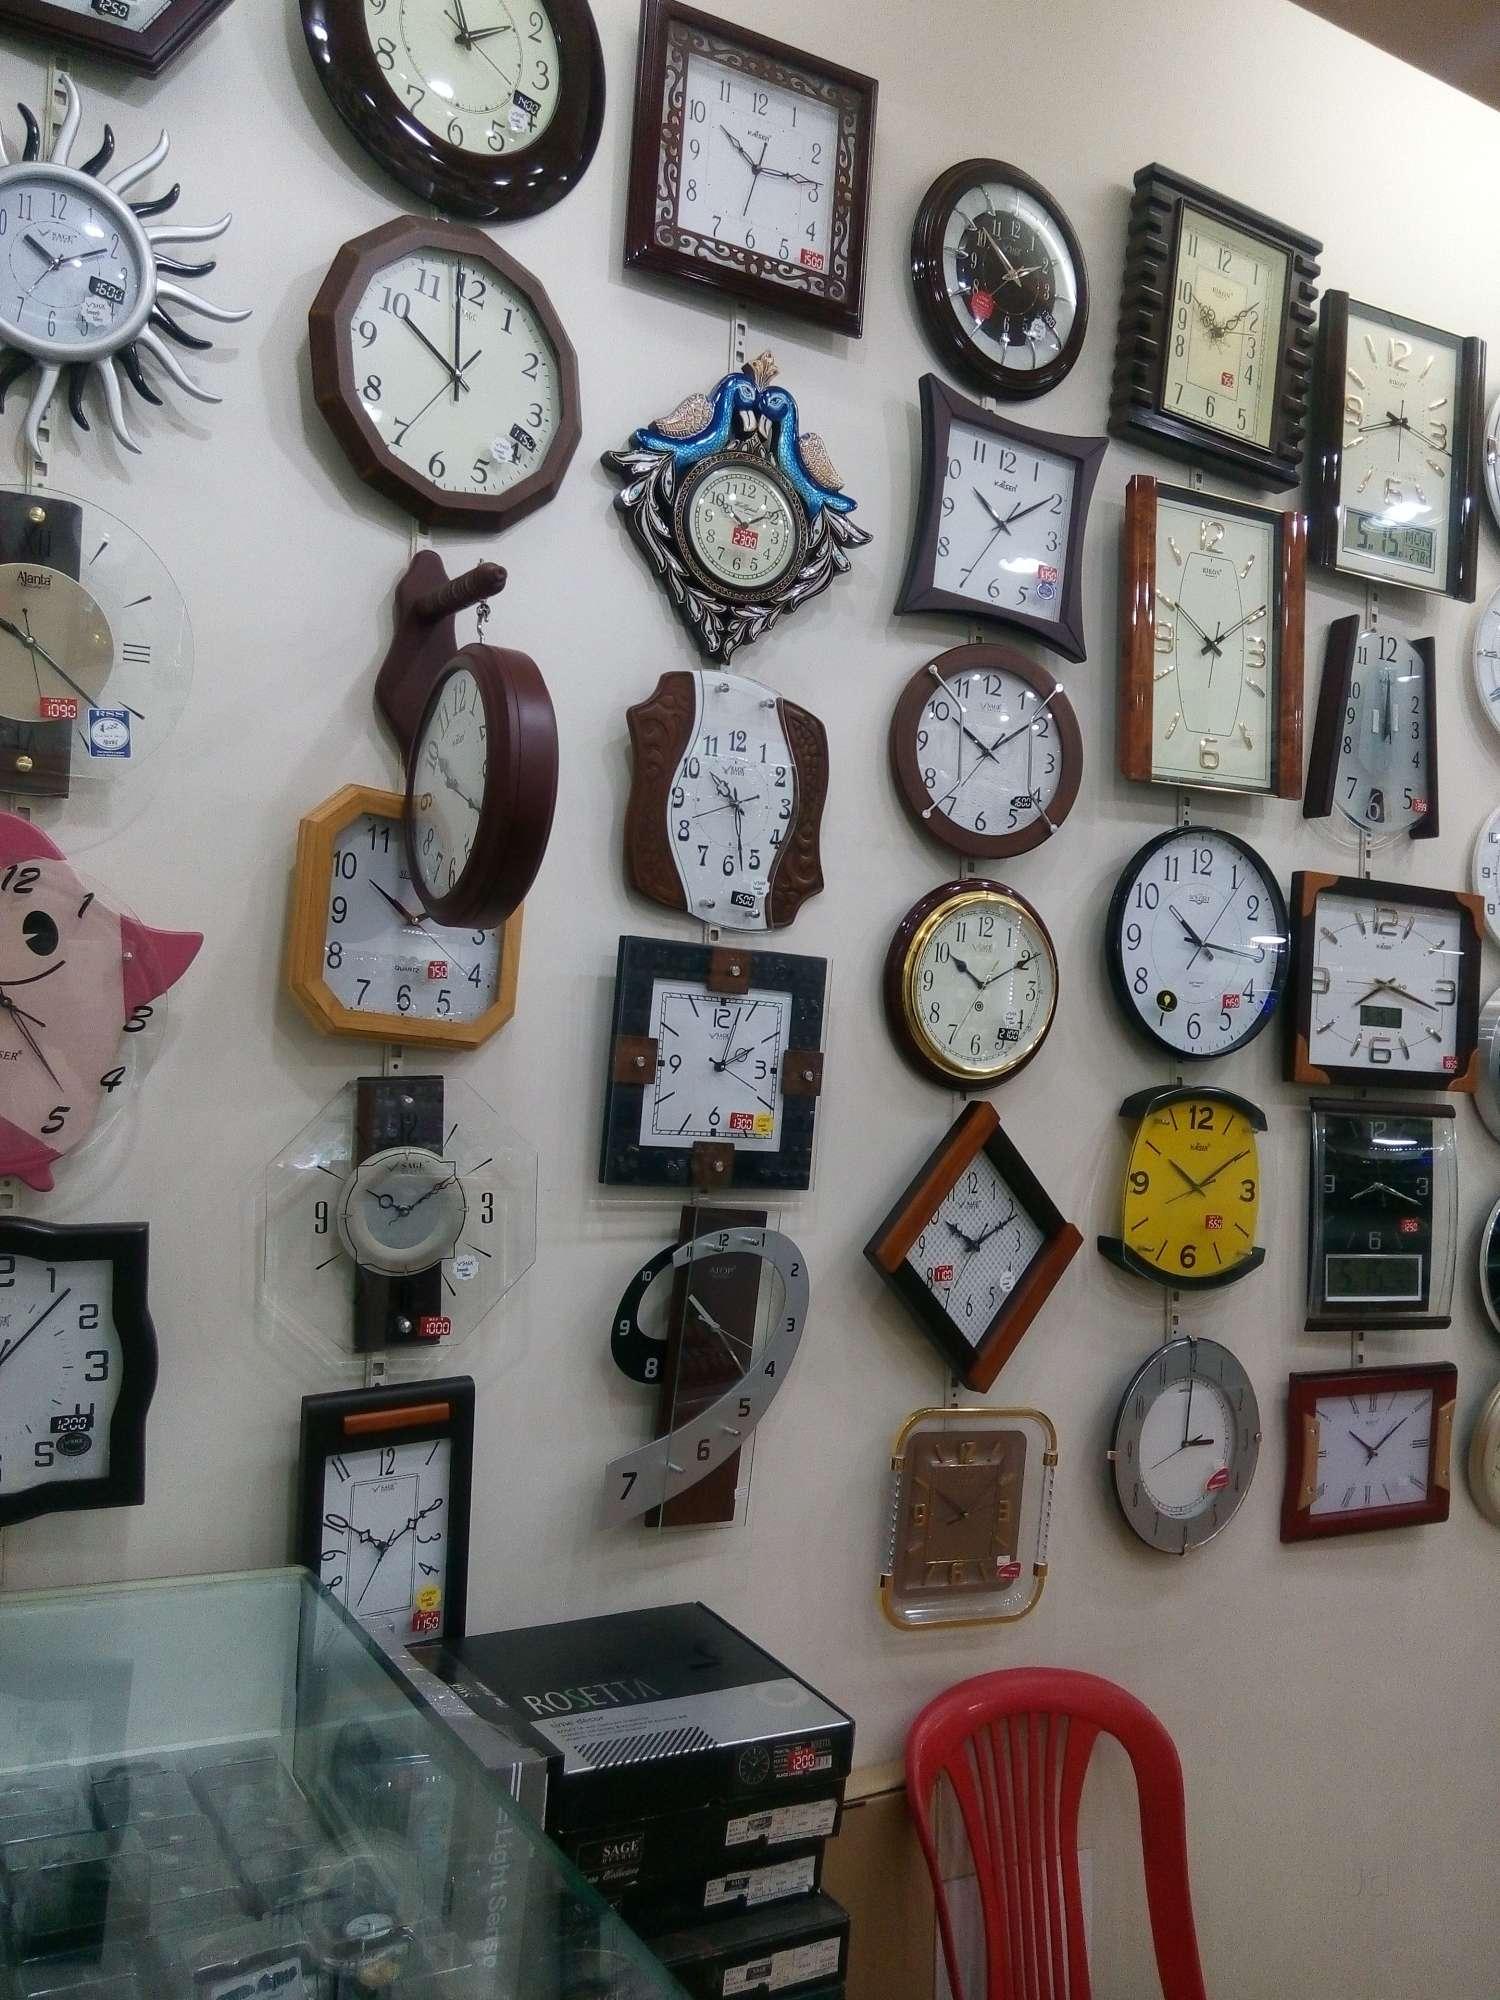 Clock showroom near me